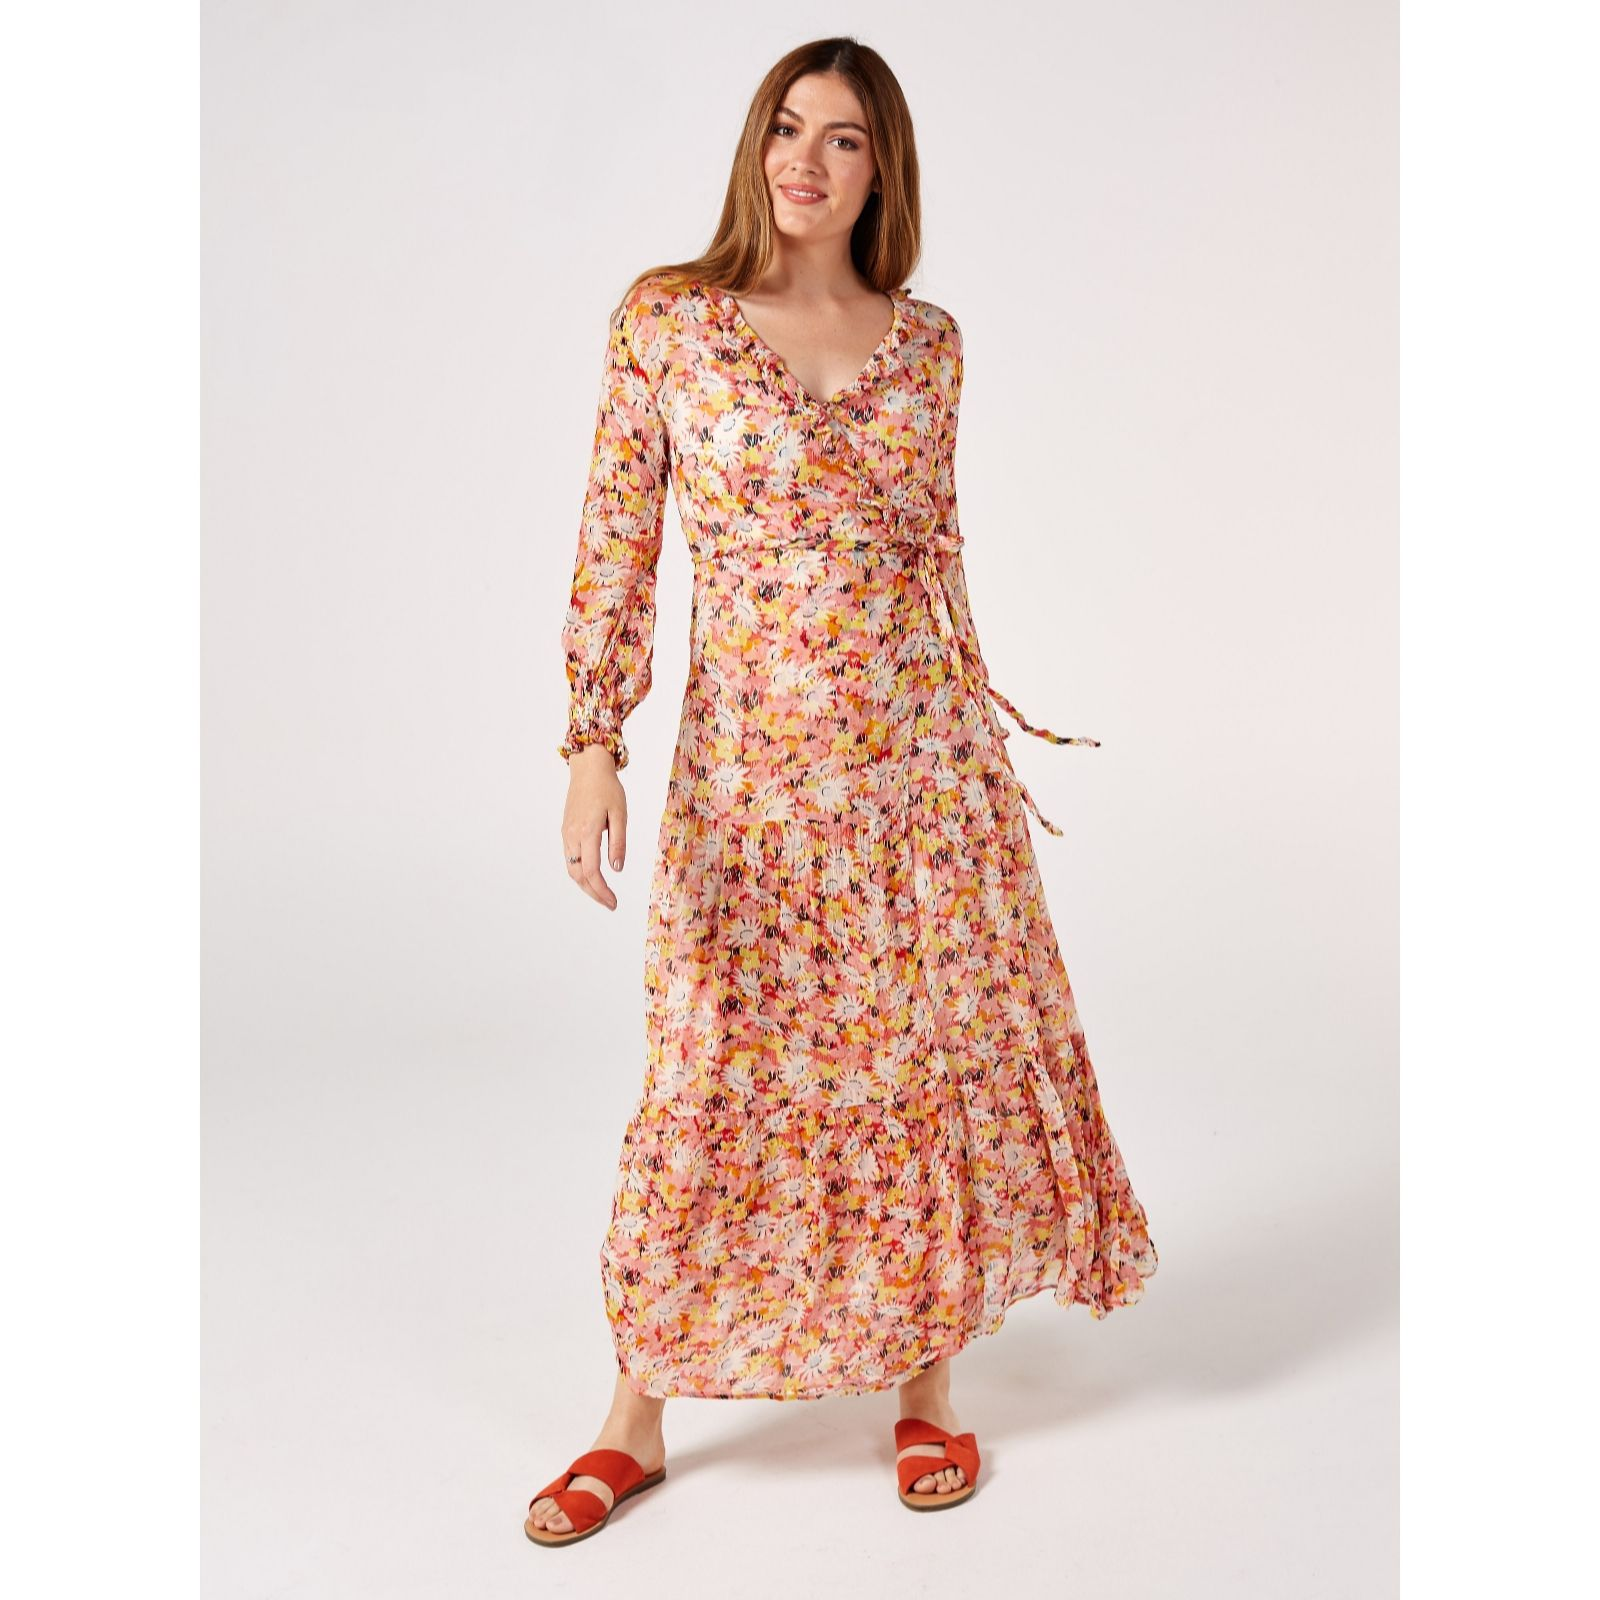 d02f2074b05a Ghost London Jasmine Retro Floral Long Sleeve Dress - QVC UK